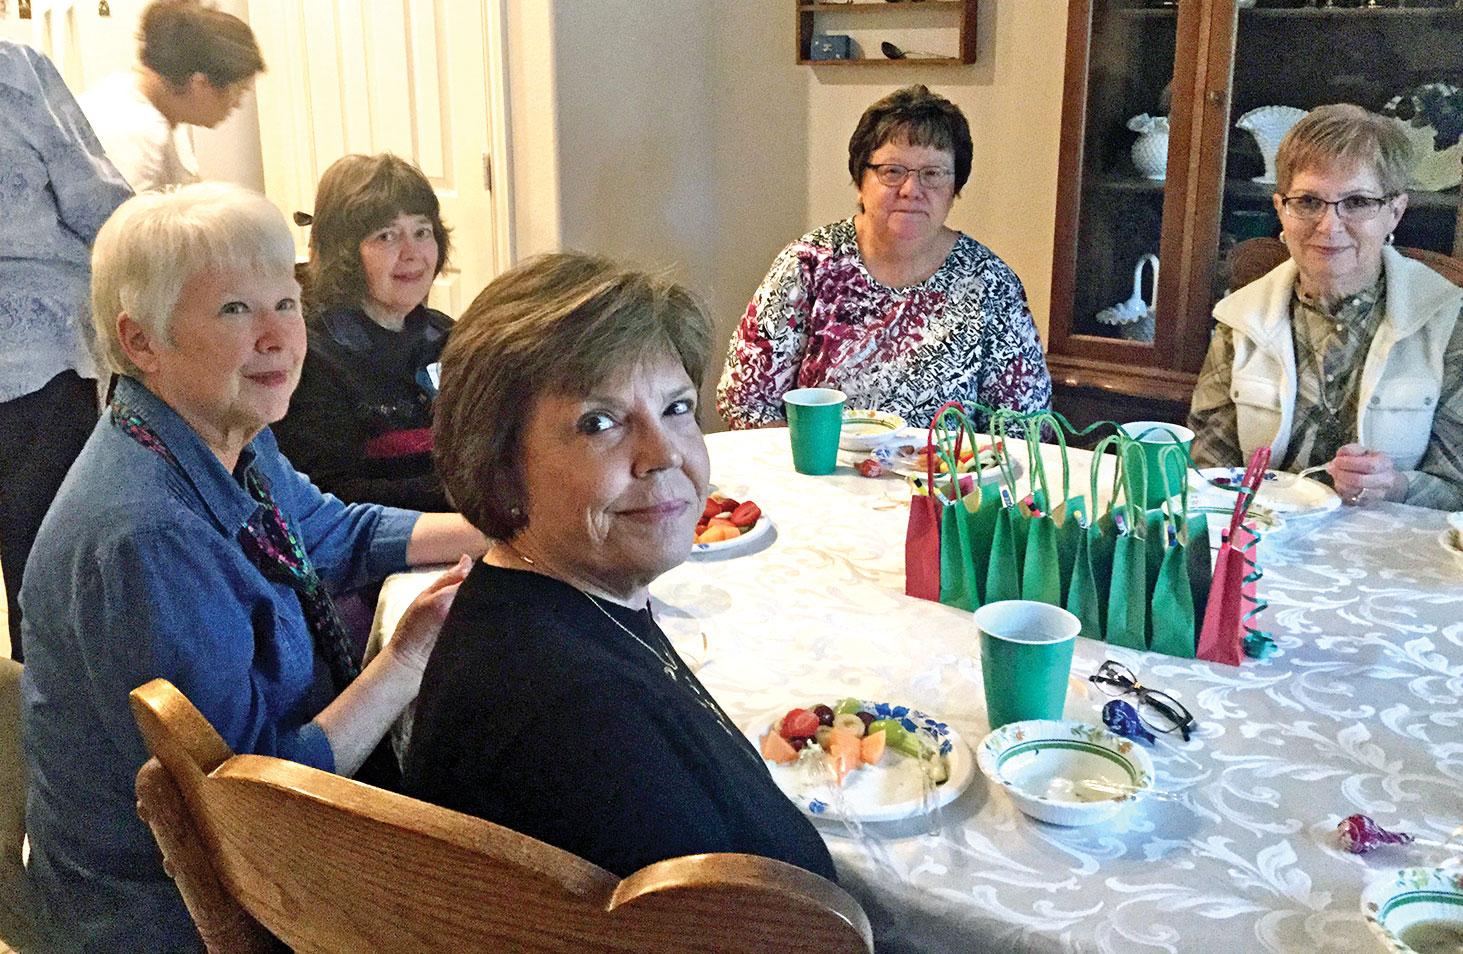 Souper Gals: Karen Soloman, Nancy Nevius, Peggy Zilinsky, Betty Silich, Jaque Guest and Carol Hansen